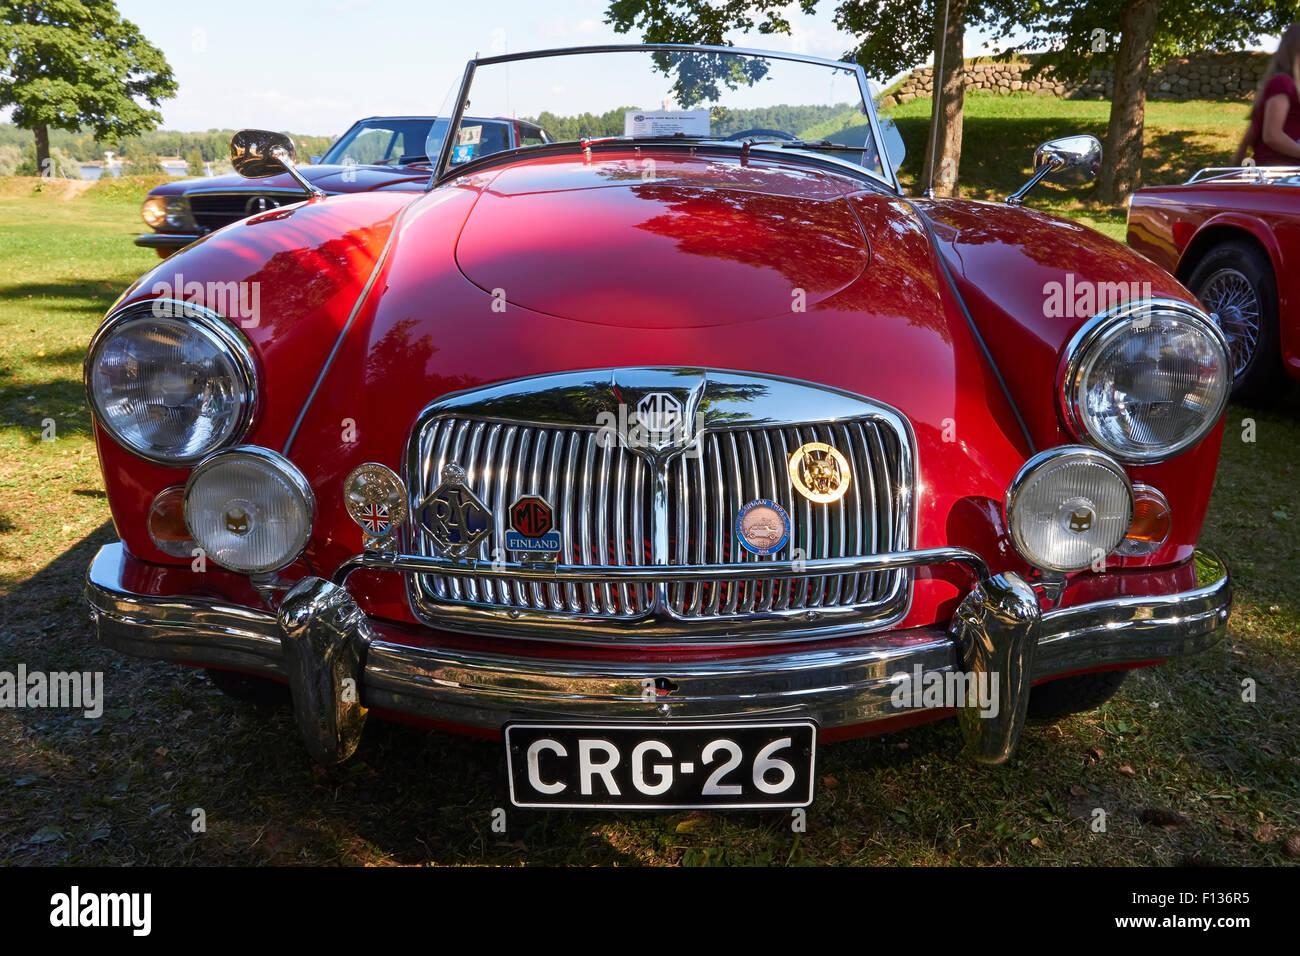 1960 MG MGA 1600 Mark I Roadster Stockbild